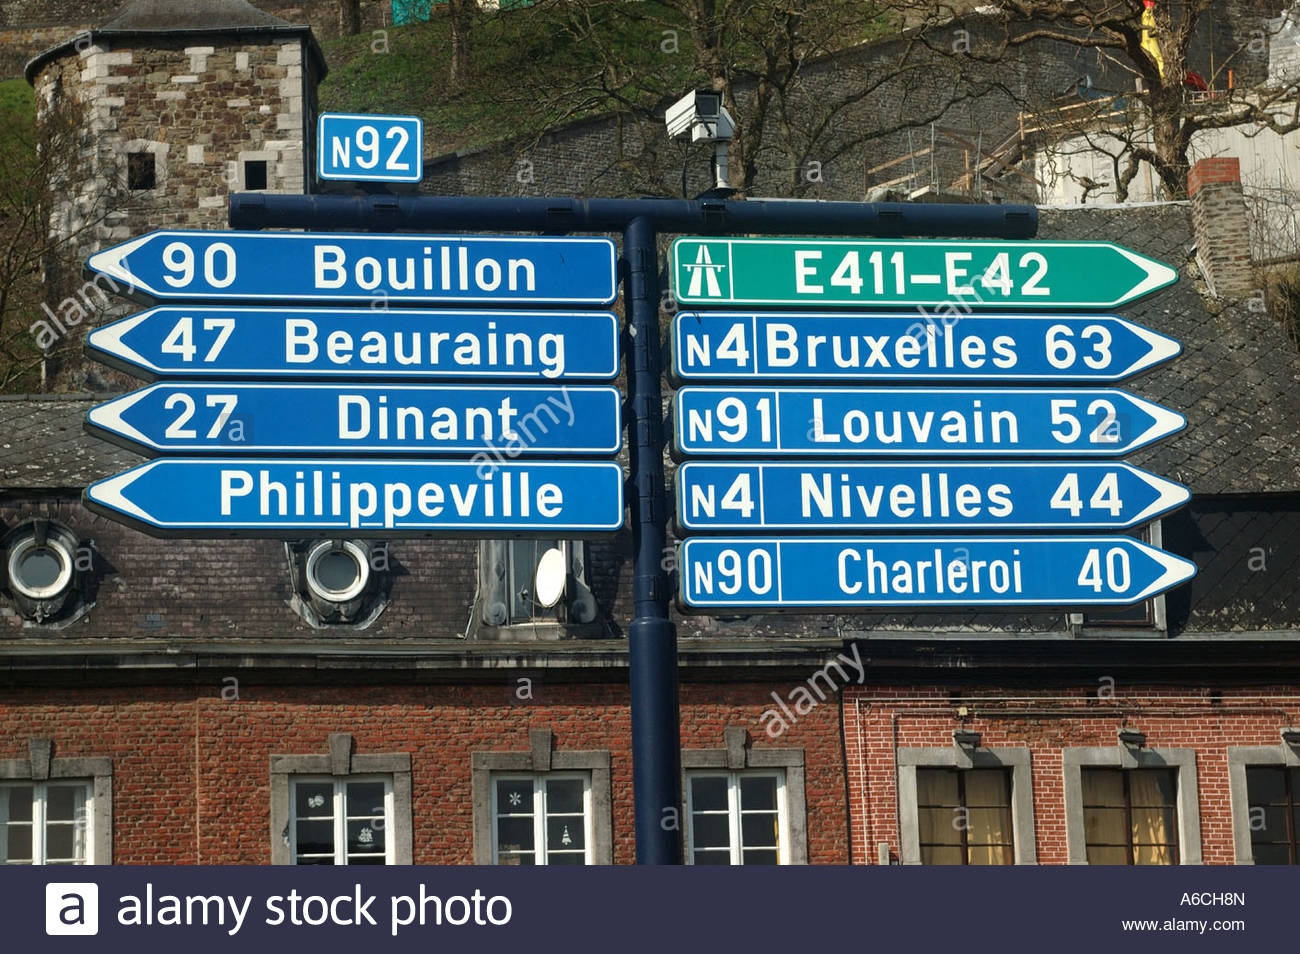 Namur Belgium  Road sign with distances. - Stock Image